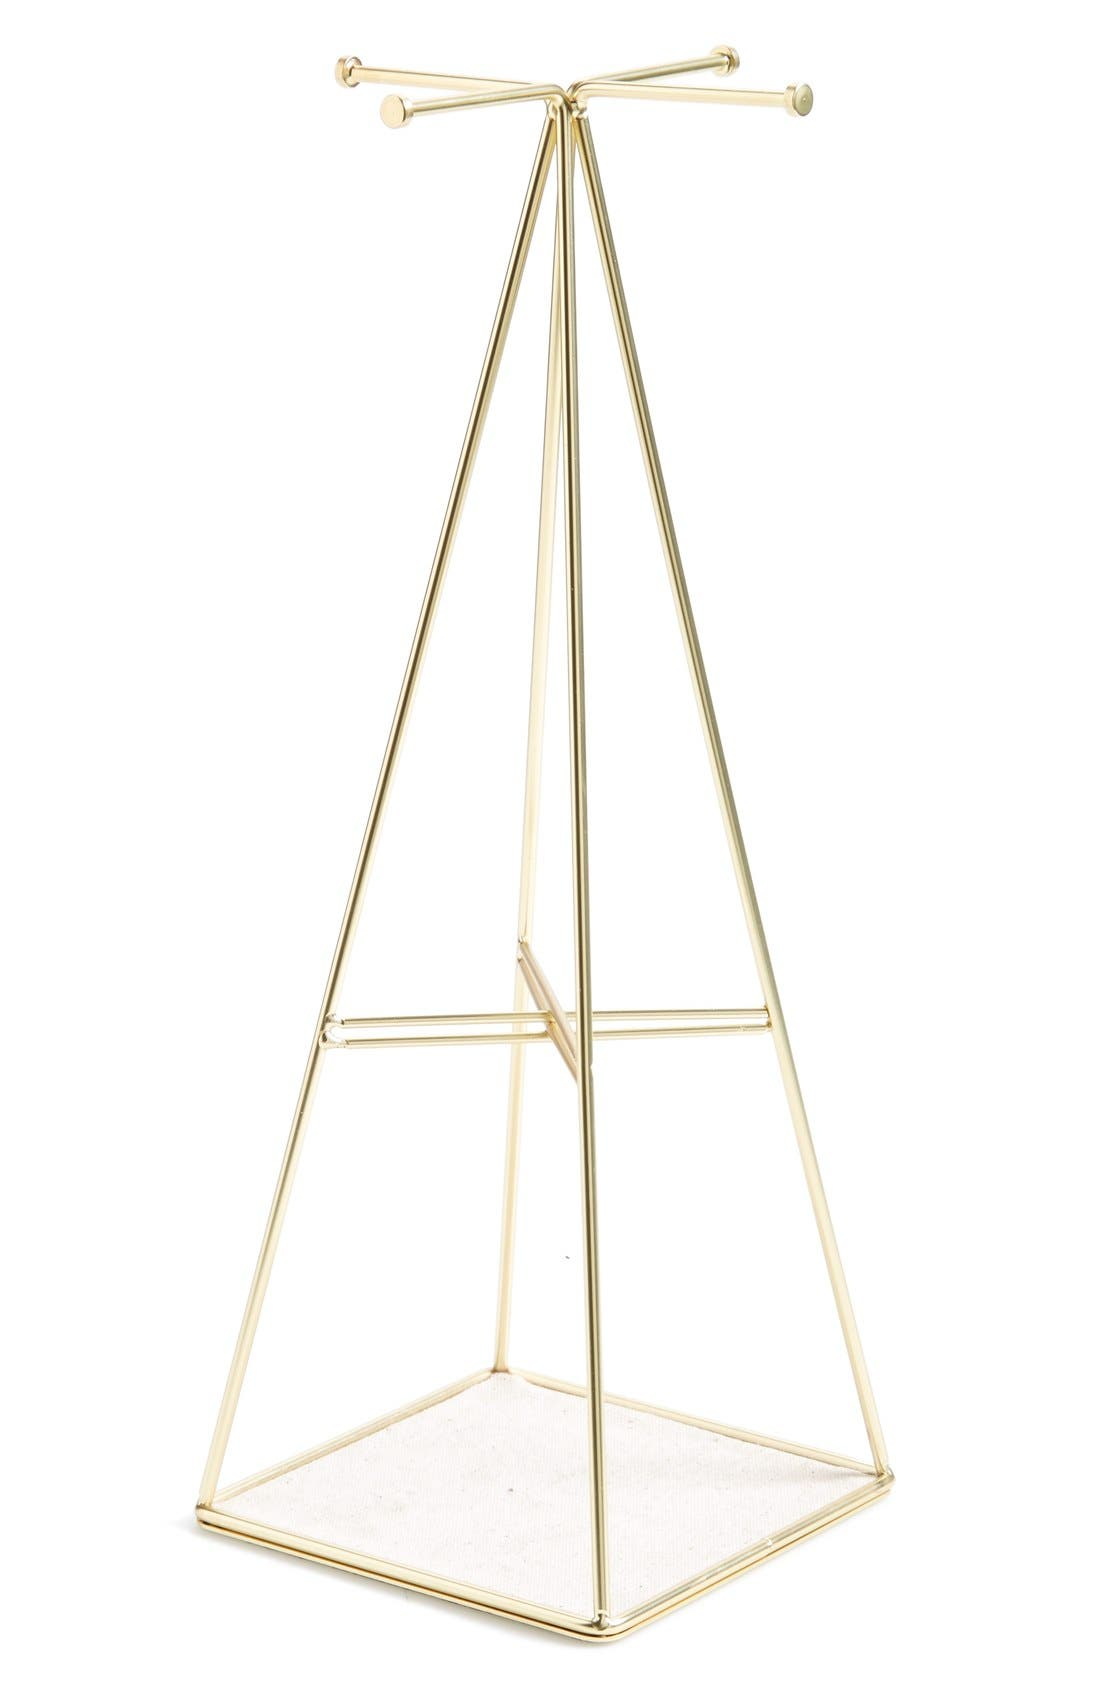 Main Image - Umbra 'Prisma' Jewelry Stand